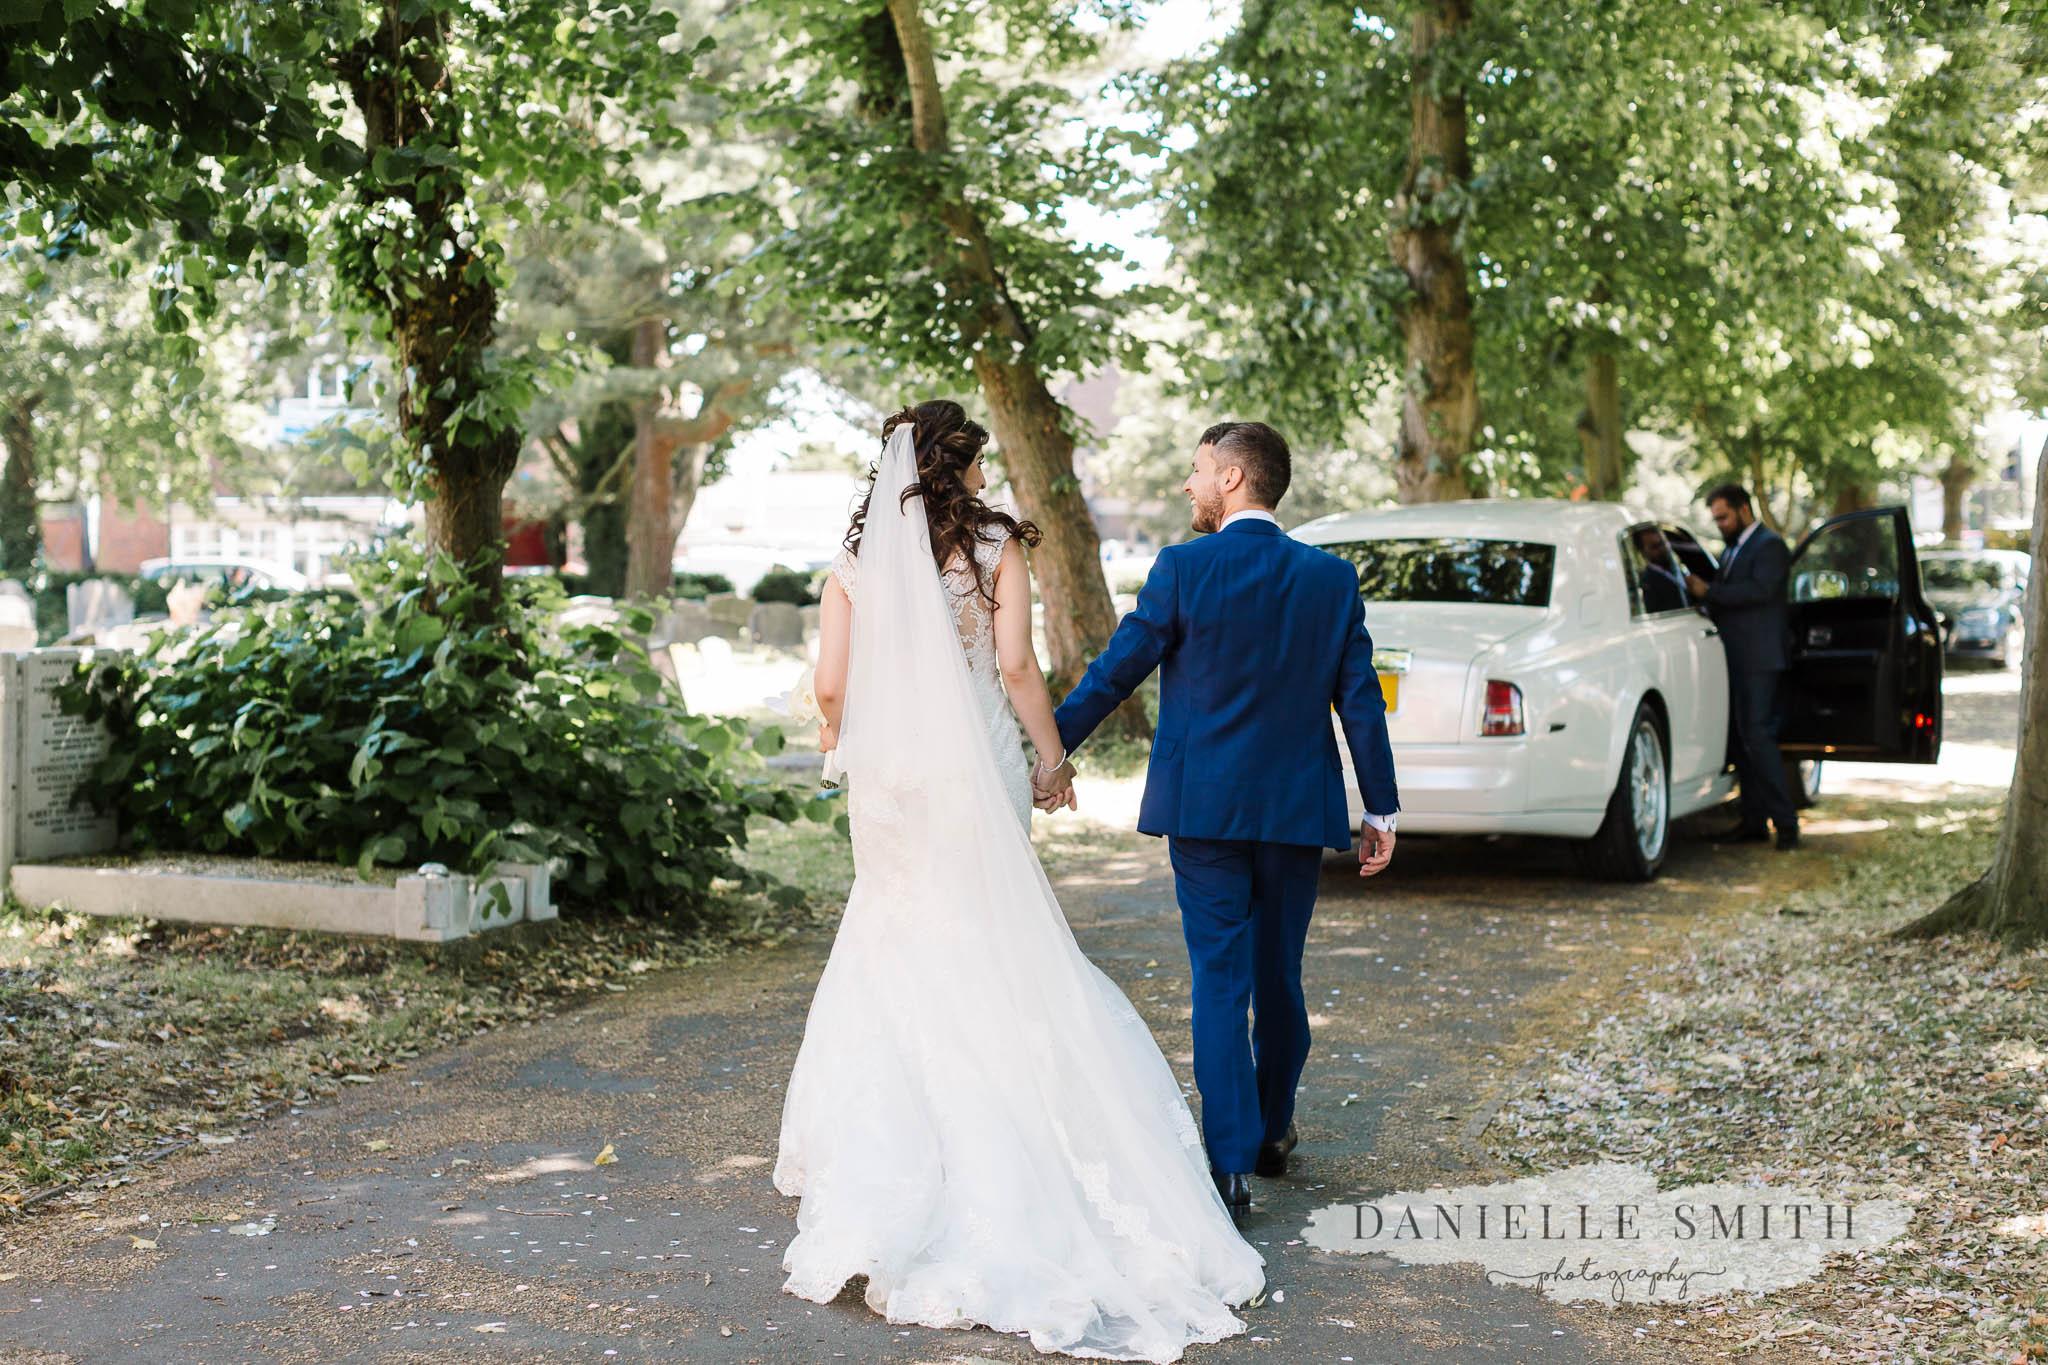 bride and groom walking towards wedding car